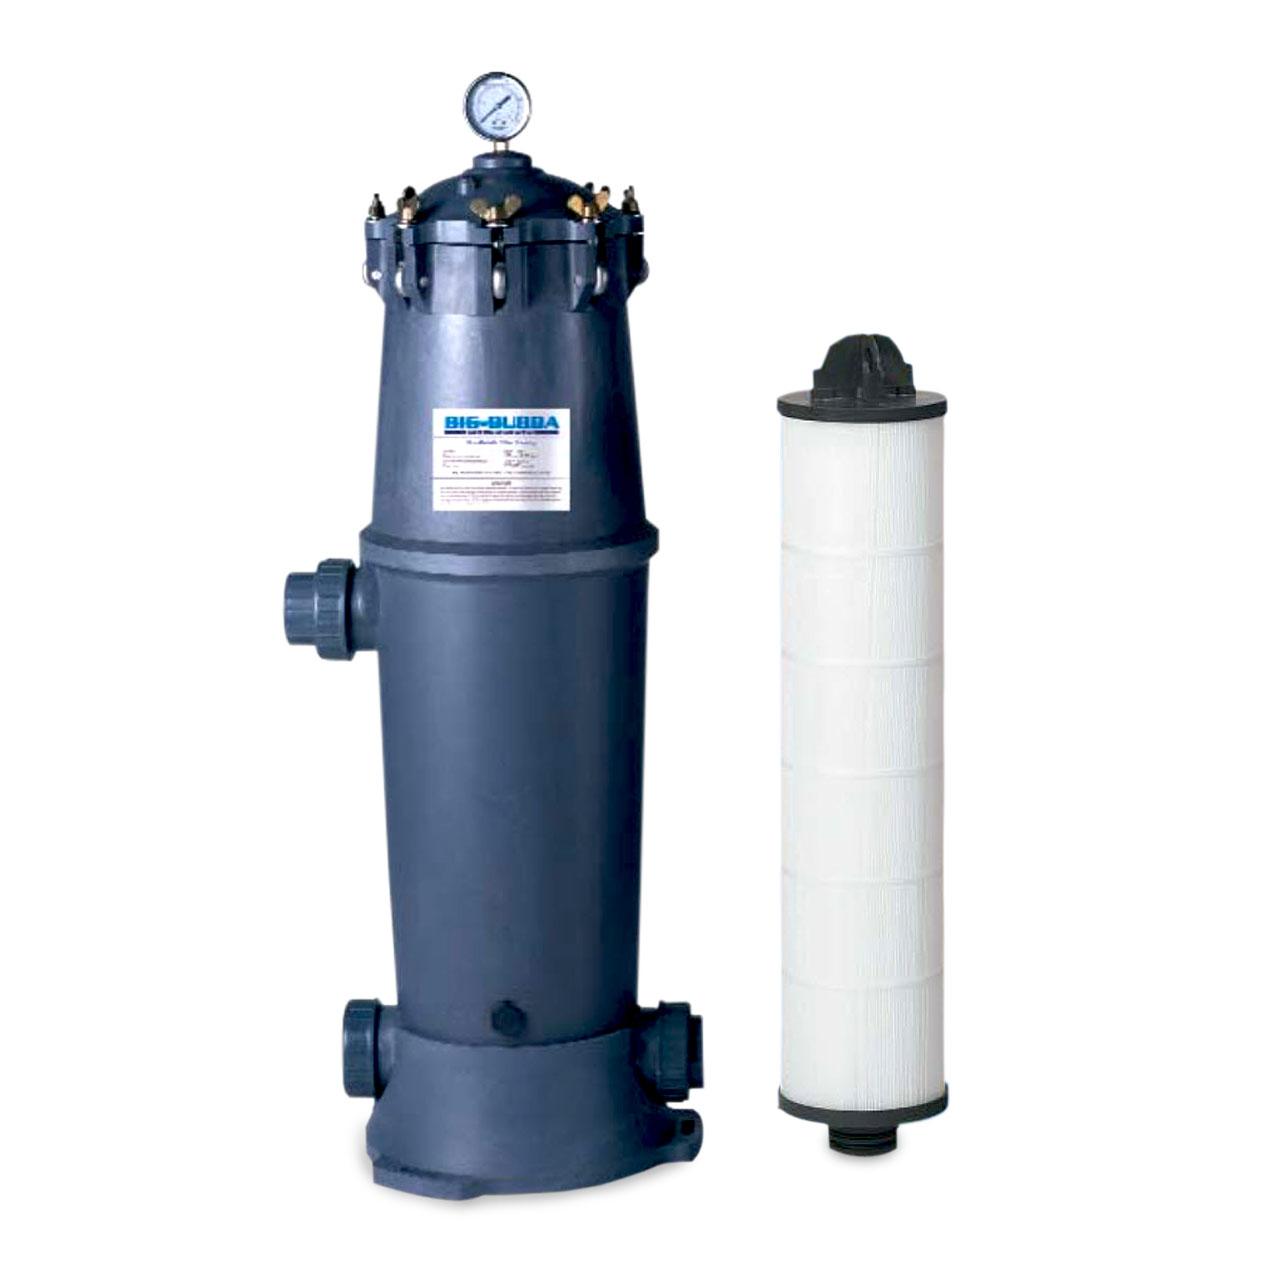 Big Bubba Plastic Filter Housing Large Water Filter Housing